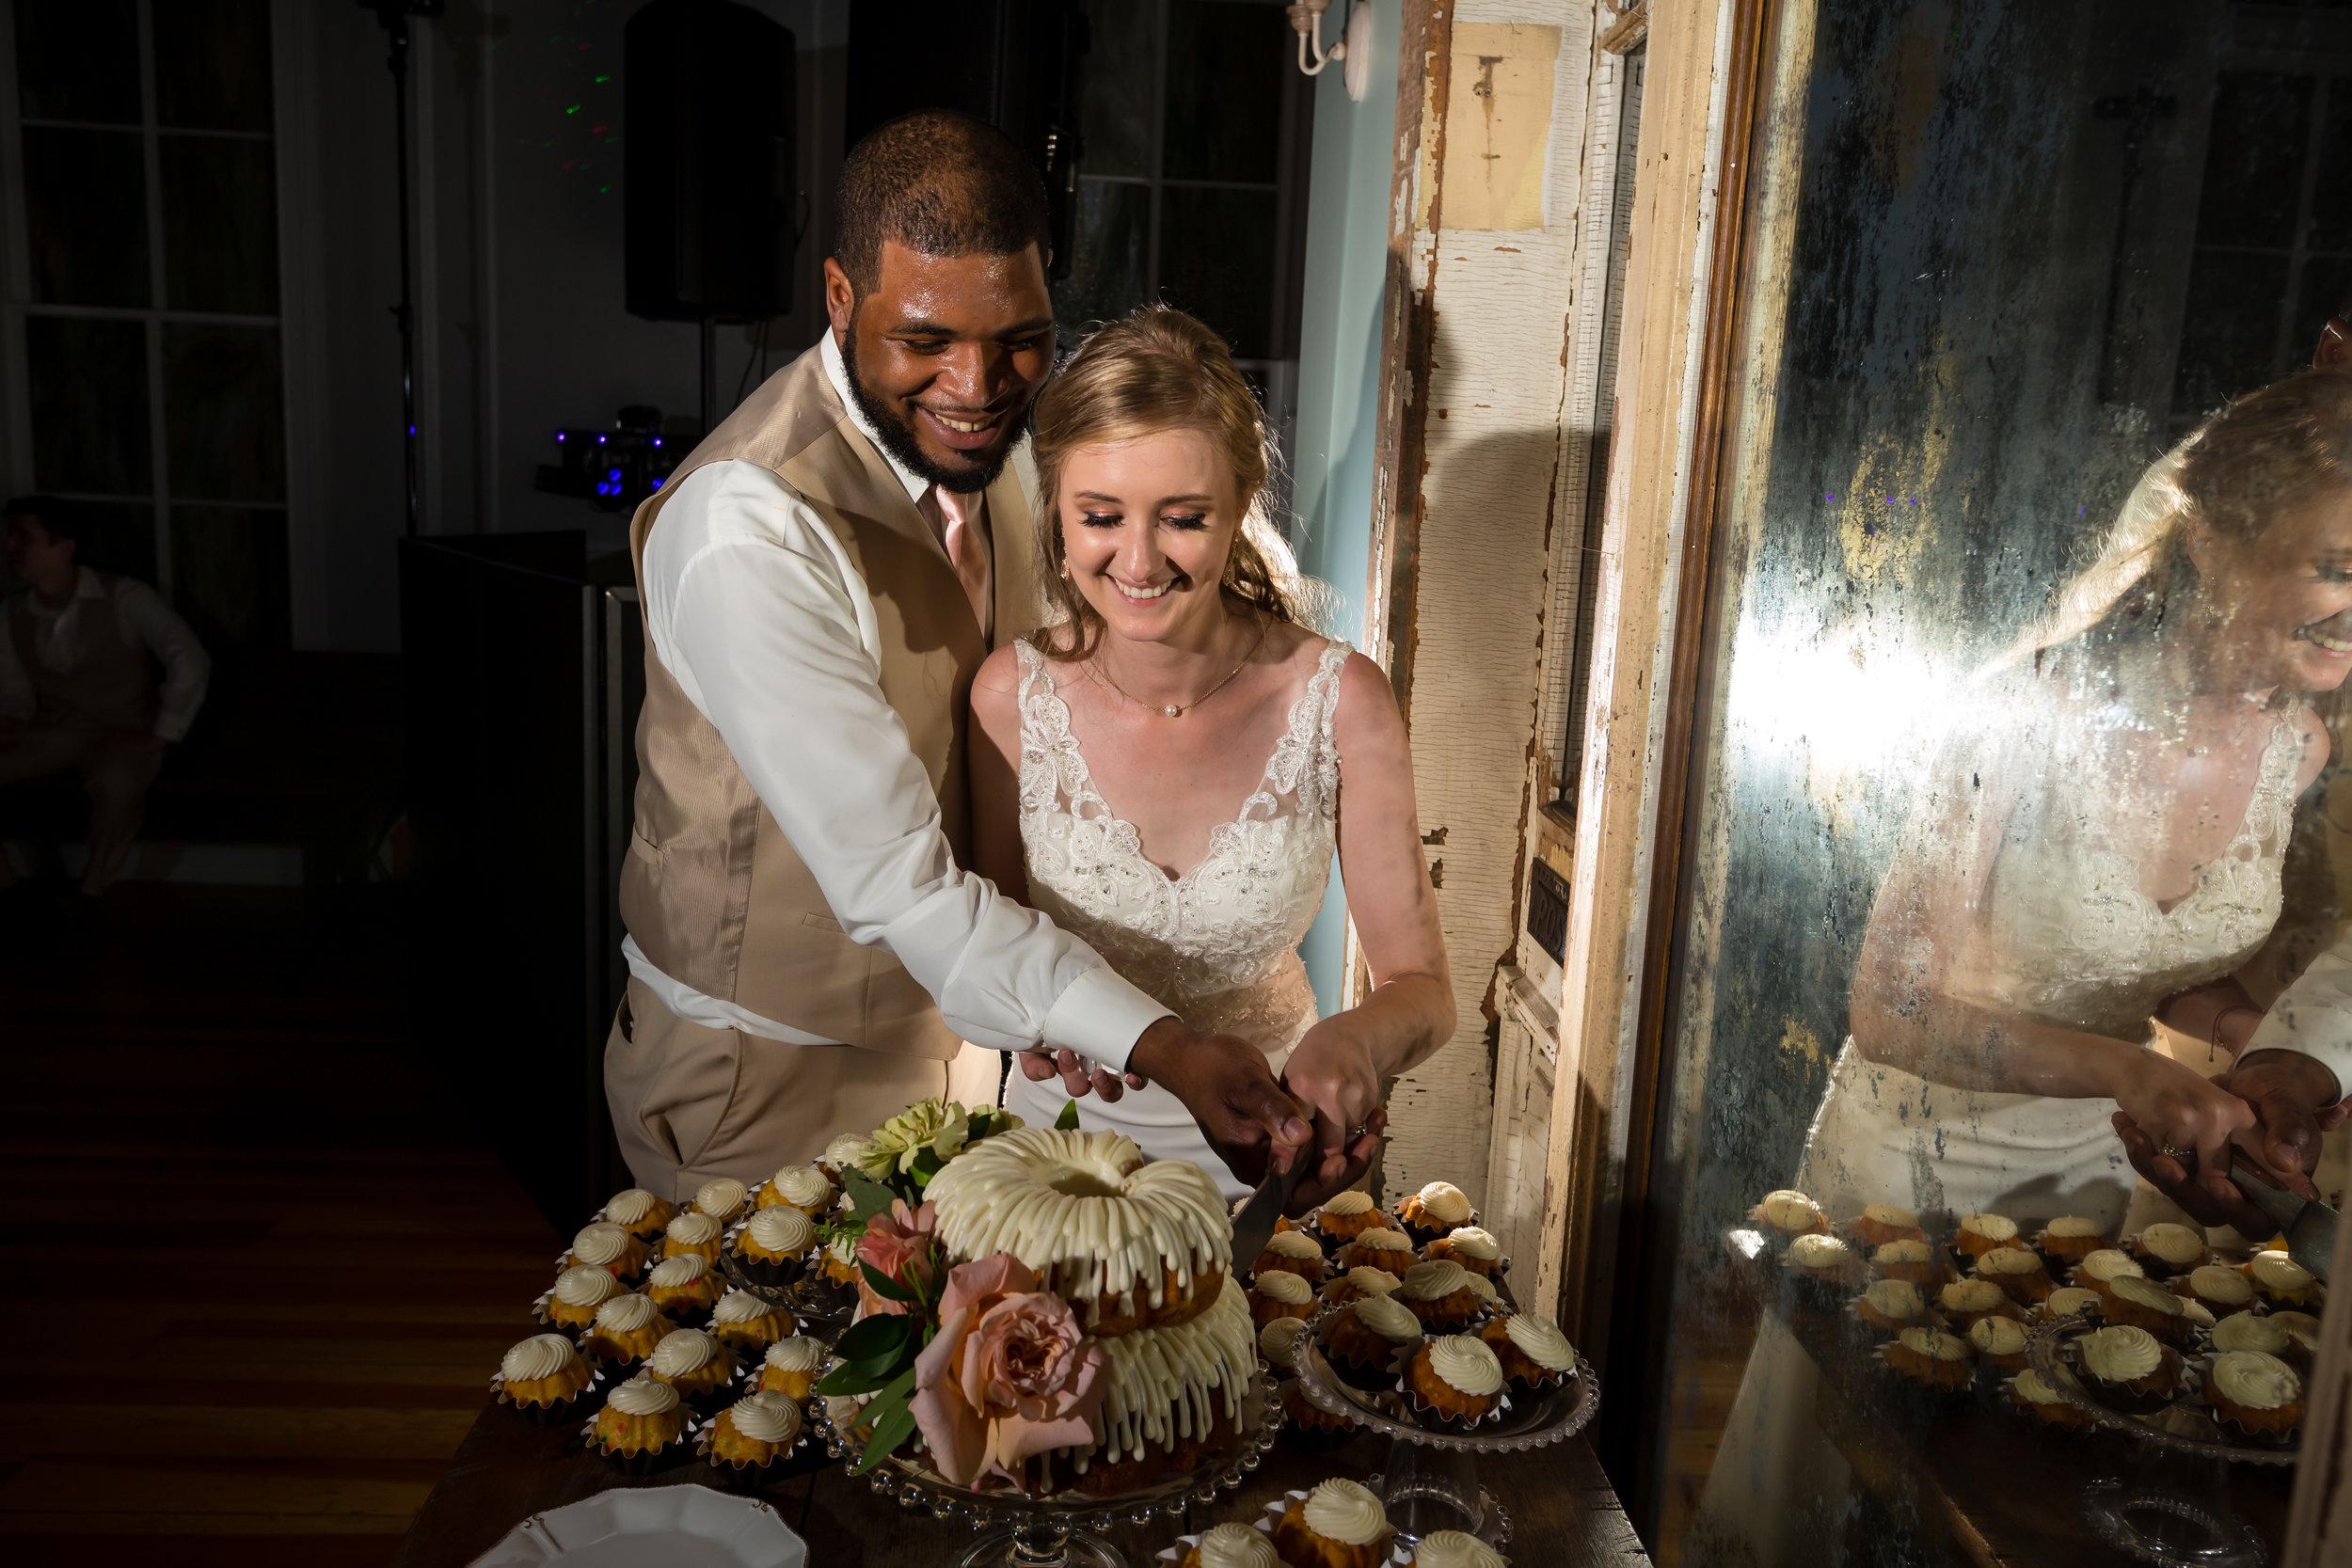 sarah_ikeem_wedding_at_the_parlour_at_manns_chapel_05.18.19-1698.jpg